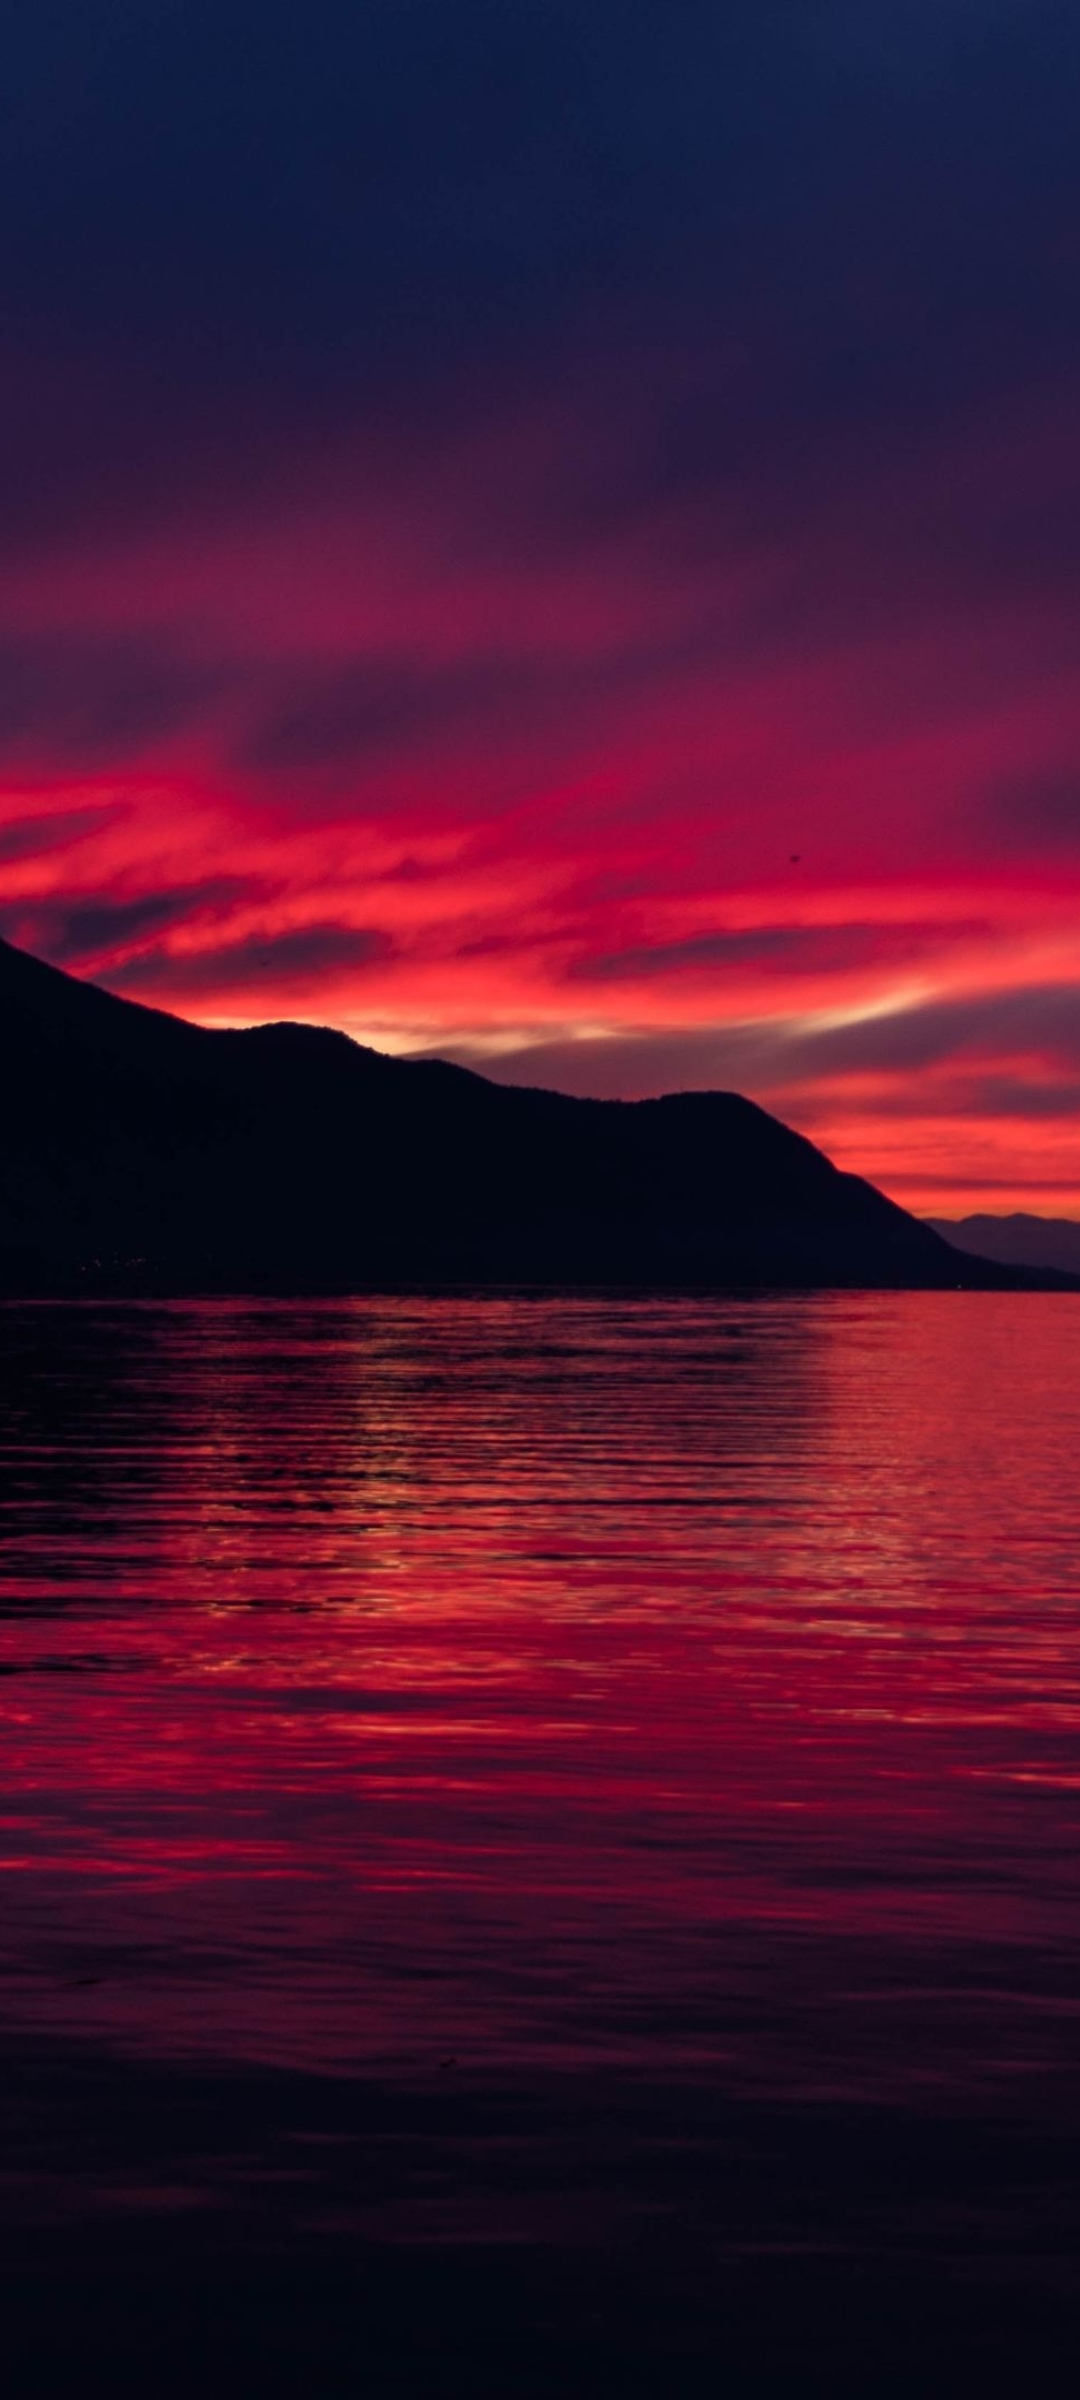 1080x2400 4K Dark Sunset 1080x2400 Resolution Wallpaper ...